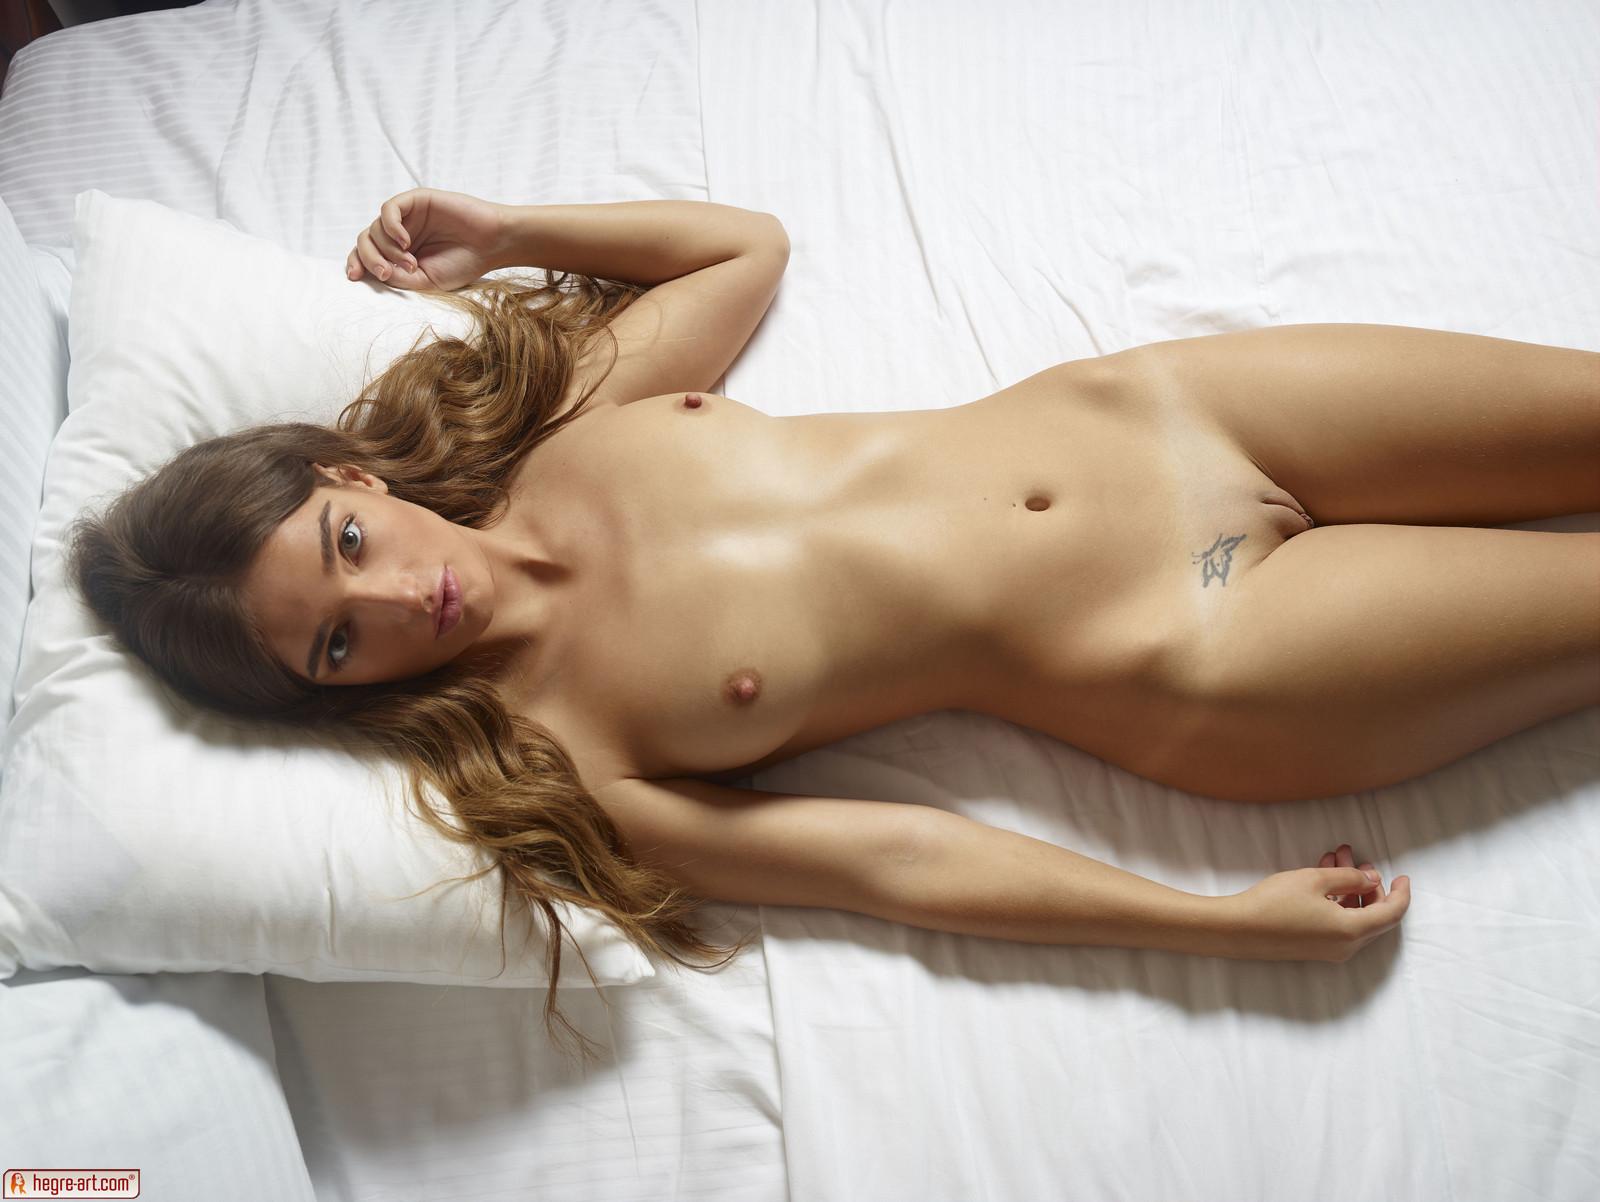 Art erotic Hegre